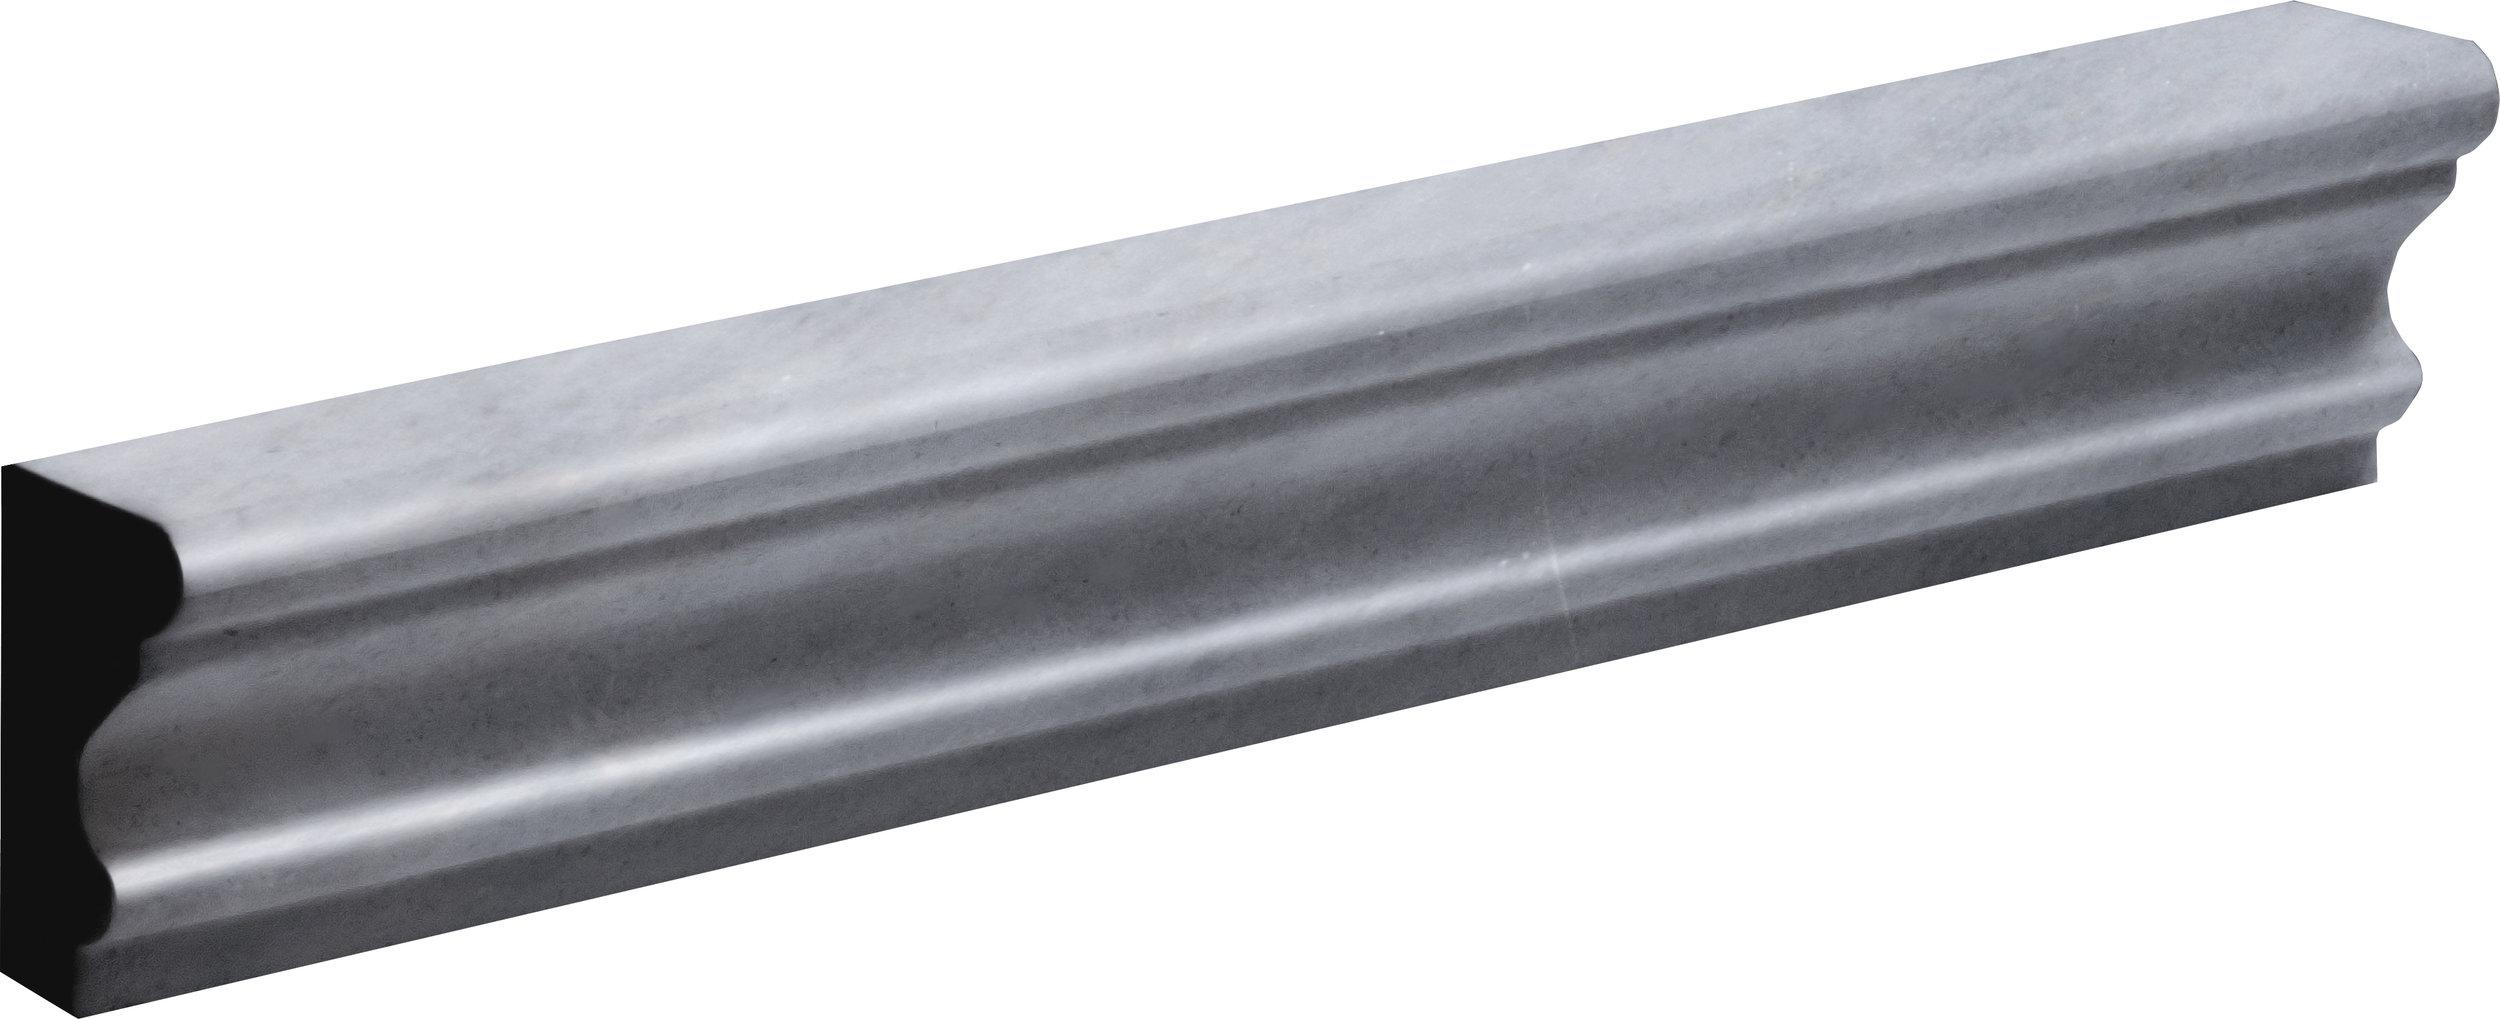 "ML00786 allure light polished andorra molding 2""x12""x1"""